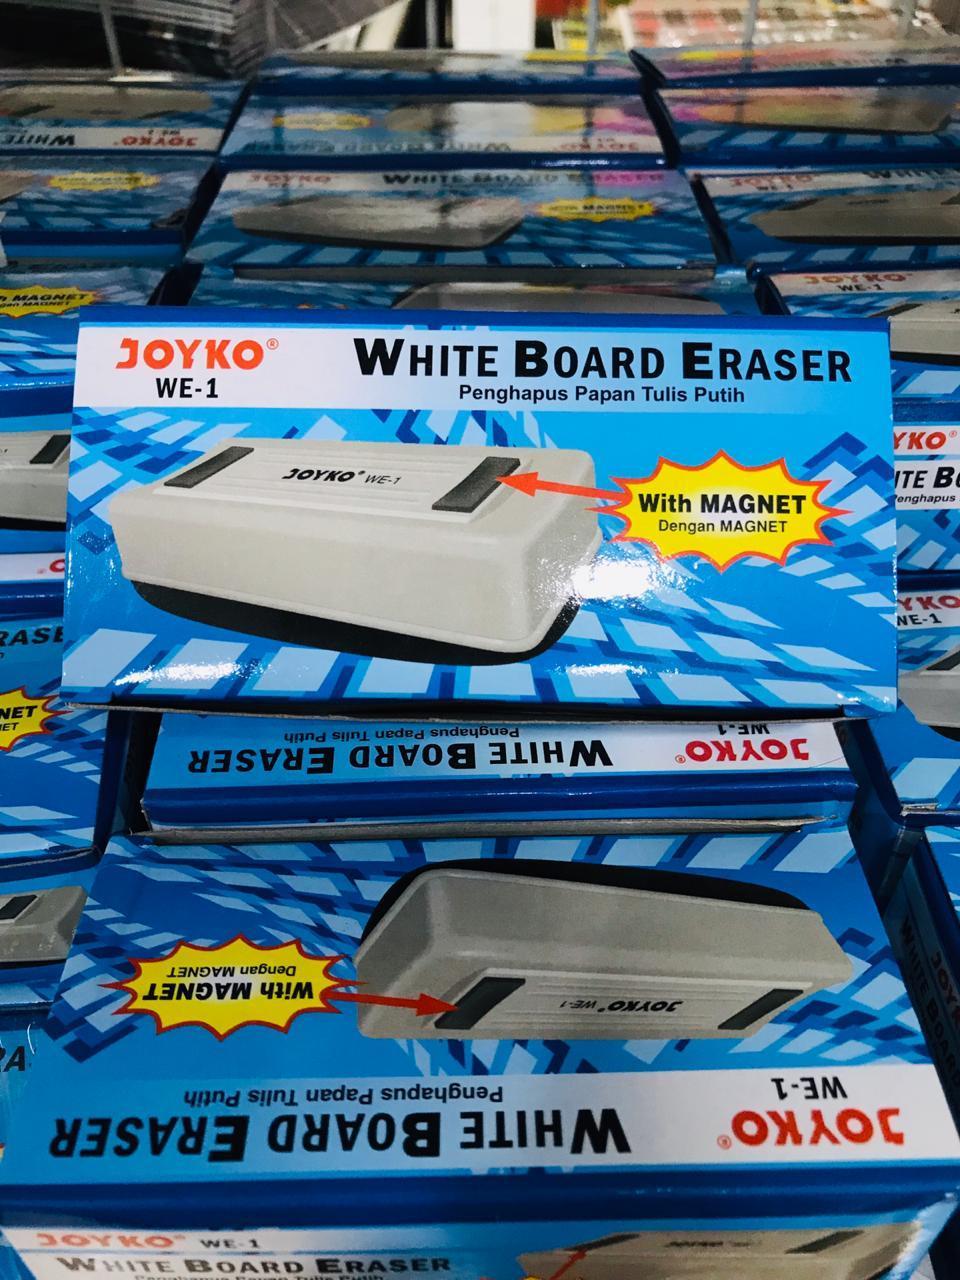 Pengahapus Papan / WhiteBoard Eraser / Penghapus / Pembersih Papan / Hapusan Papan / Penghapus Papan Joyco Termurah